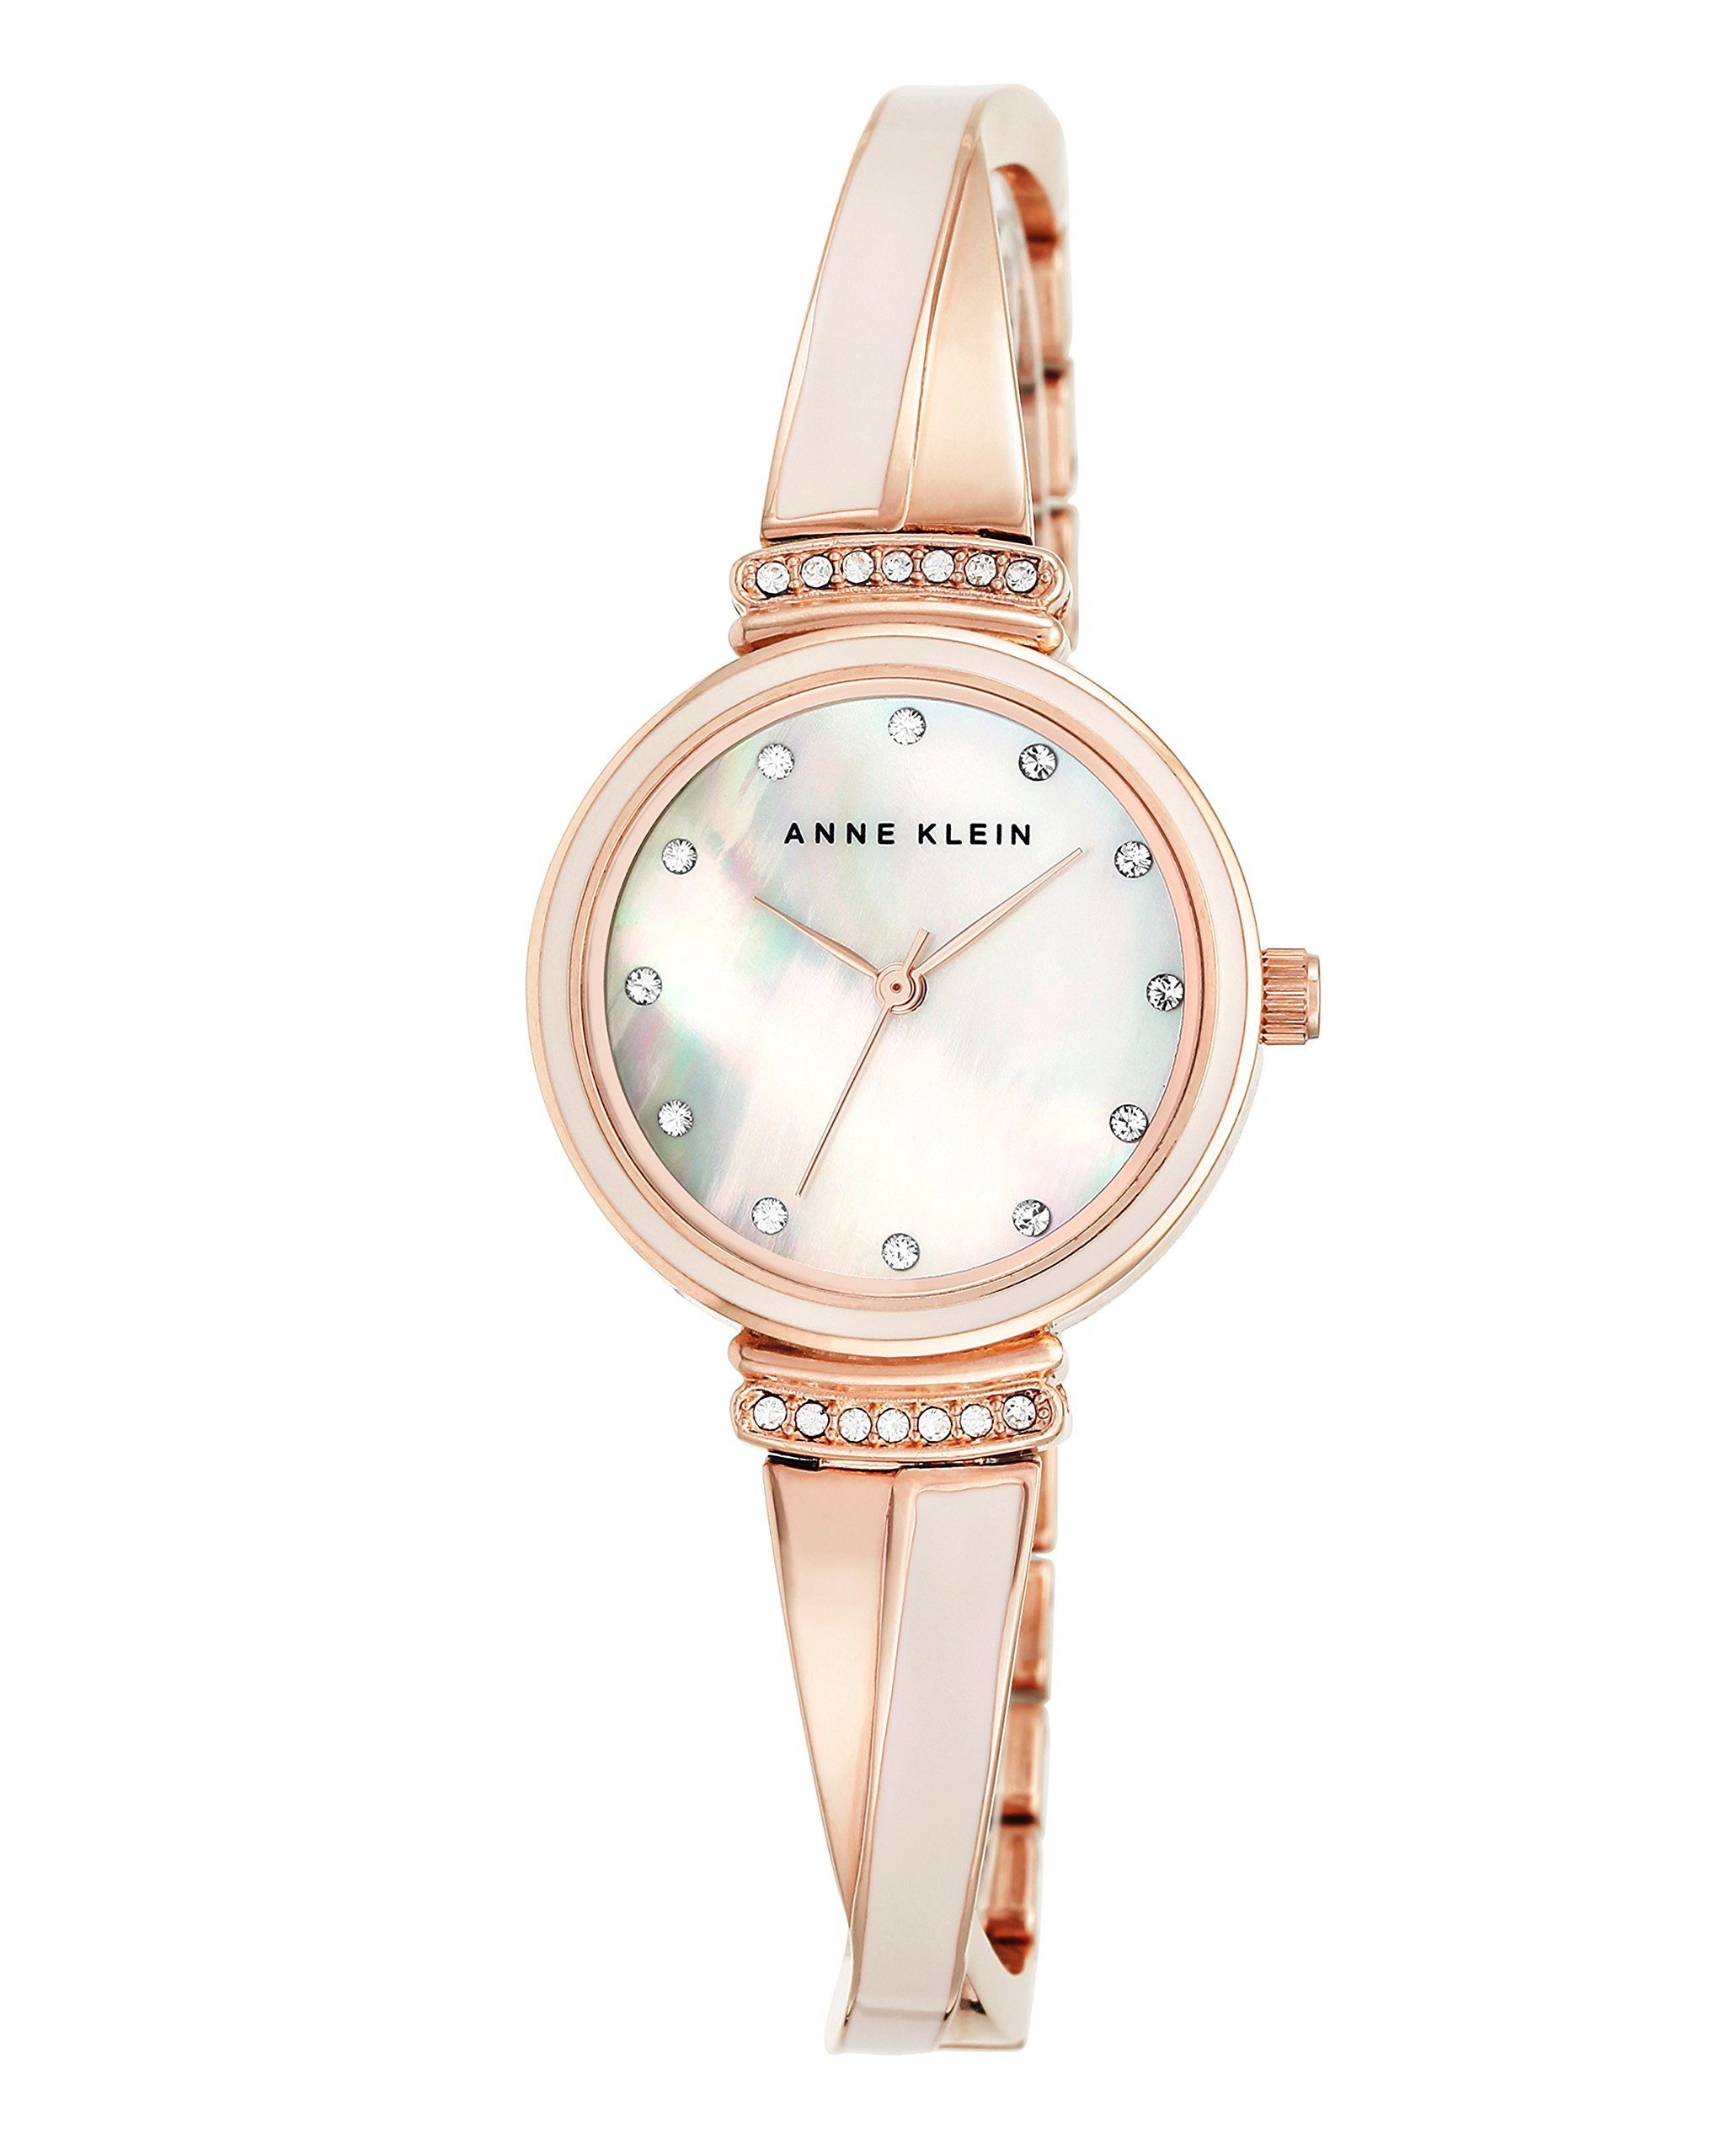 Anne Klein Women's AK/2216BLRG Swarovski Crystal-Accented Rose Gold-Tone and Blush Pink Bangle Watch